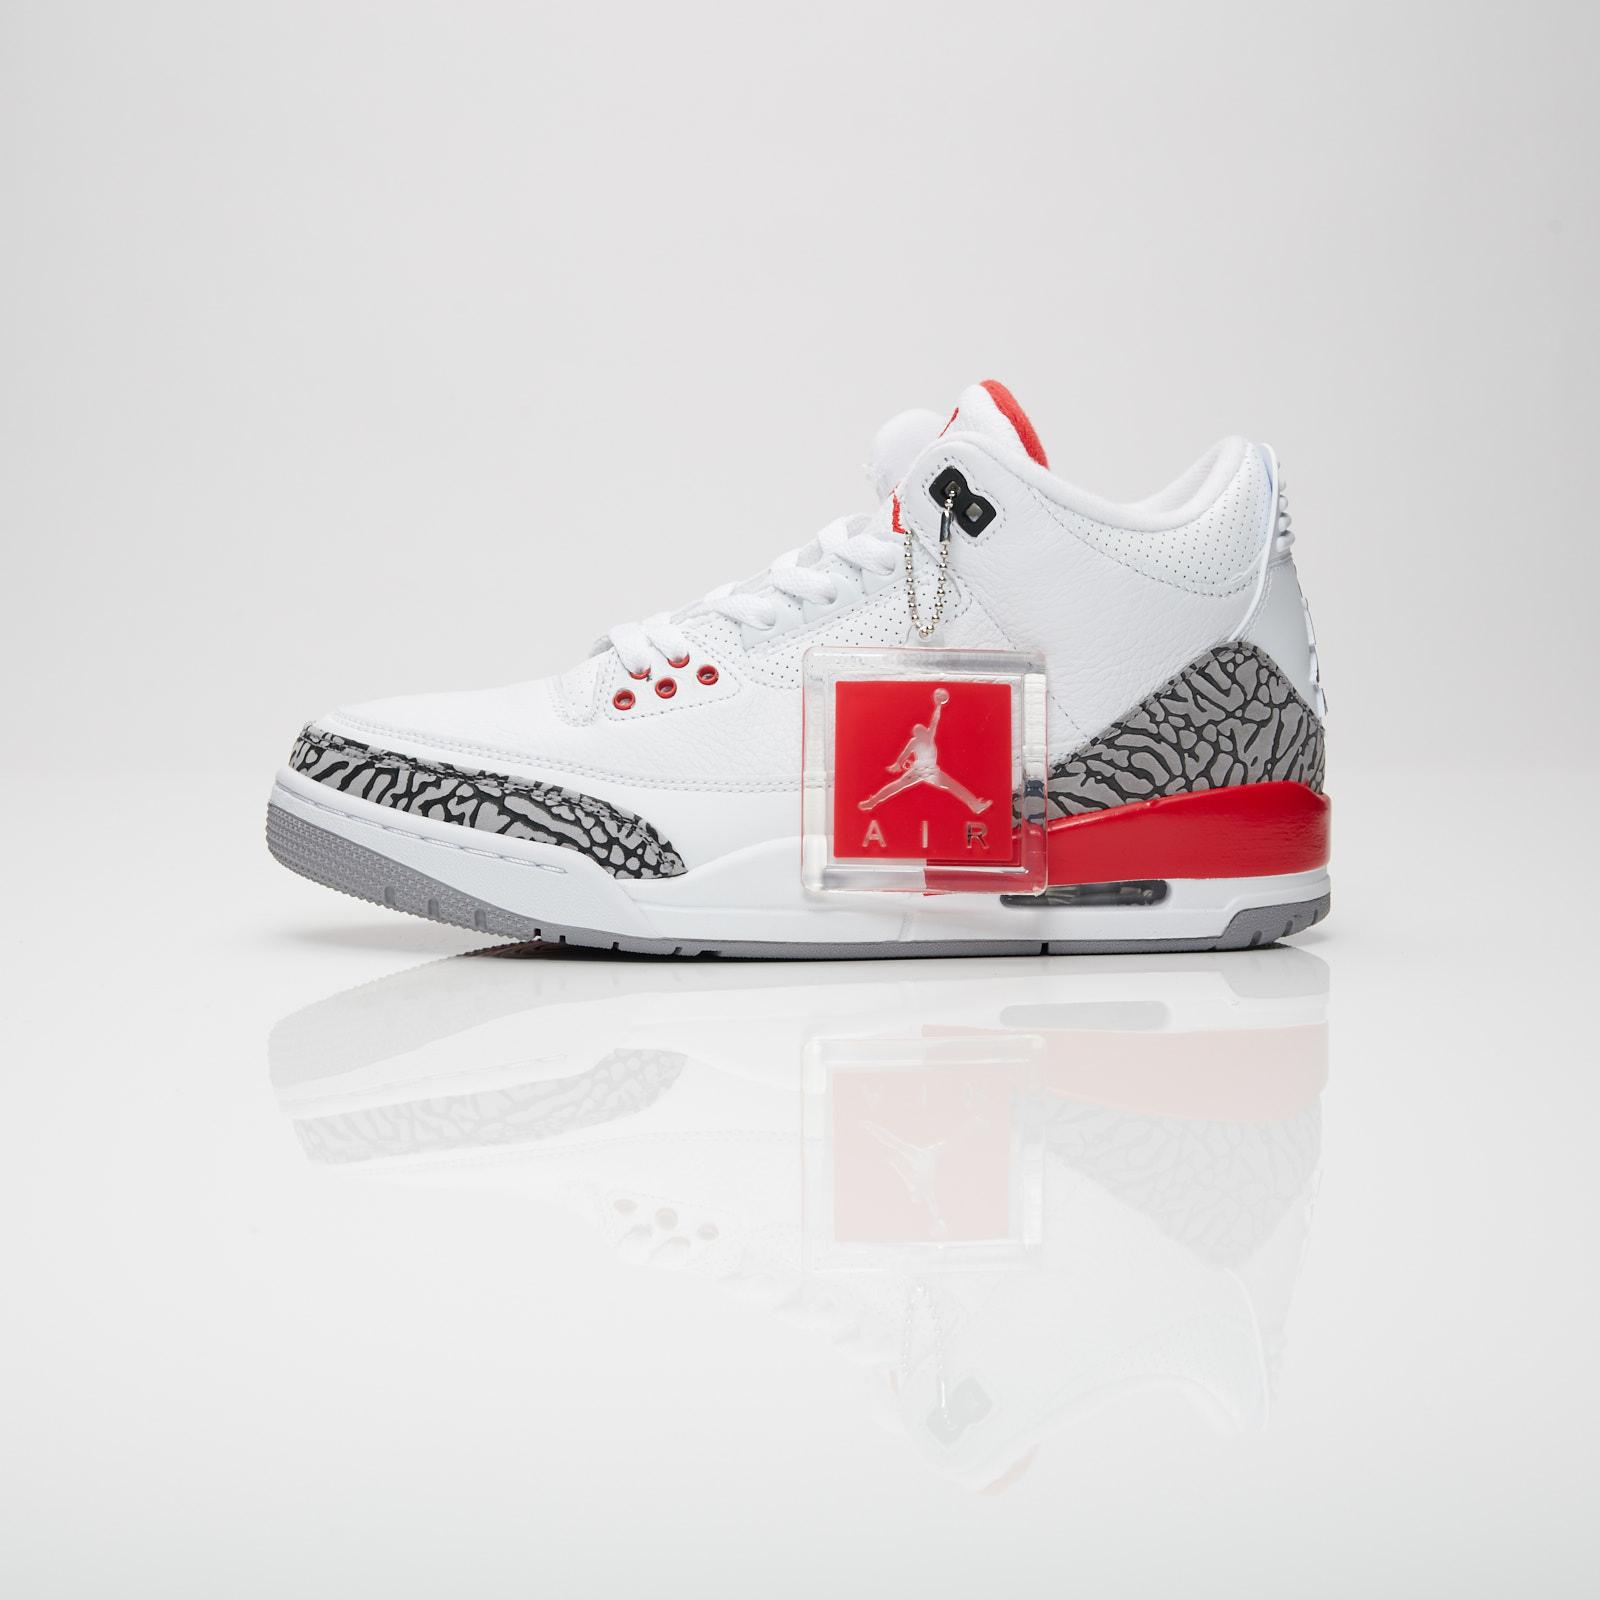 59d8975f78a500 Jordan Brand Air Jordan 3 Retro - 136064-116 - Sneakersnstuff ...